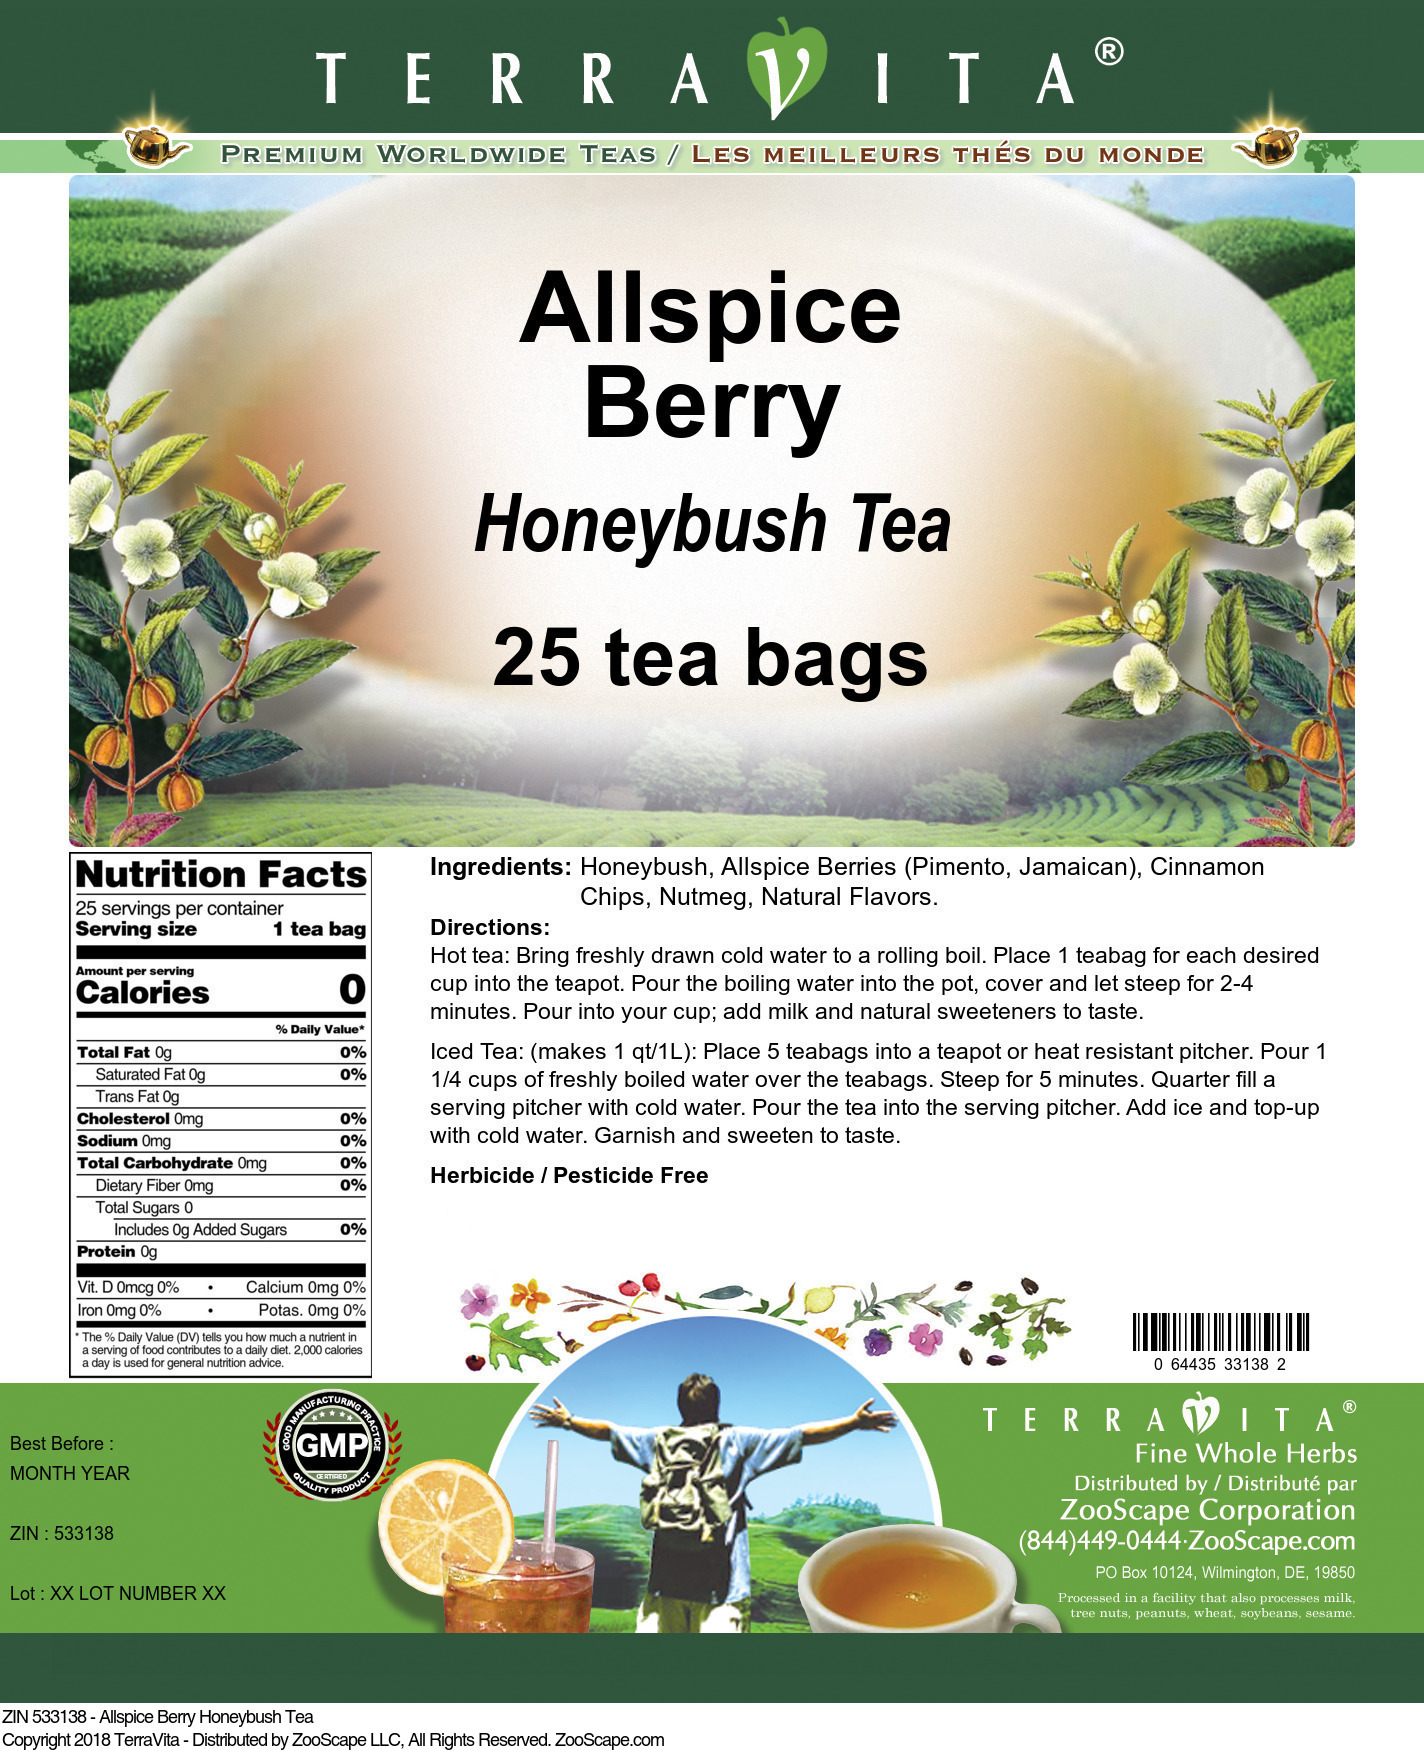 Allspice Berry Honeybush Tea